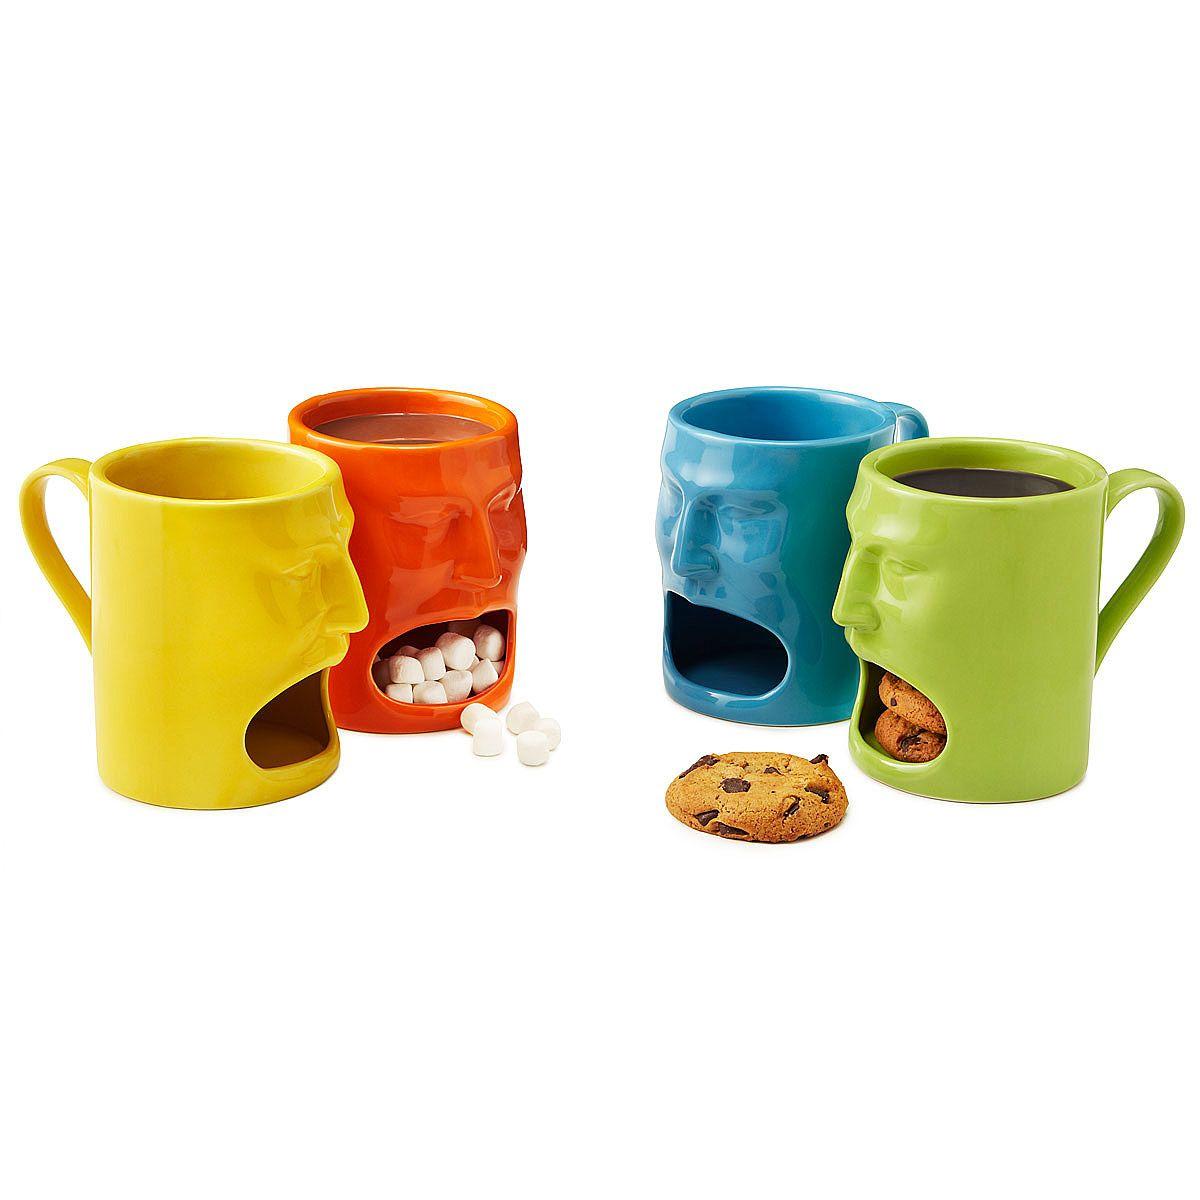 Medium Of Funny Shaped Mugs